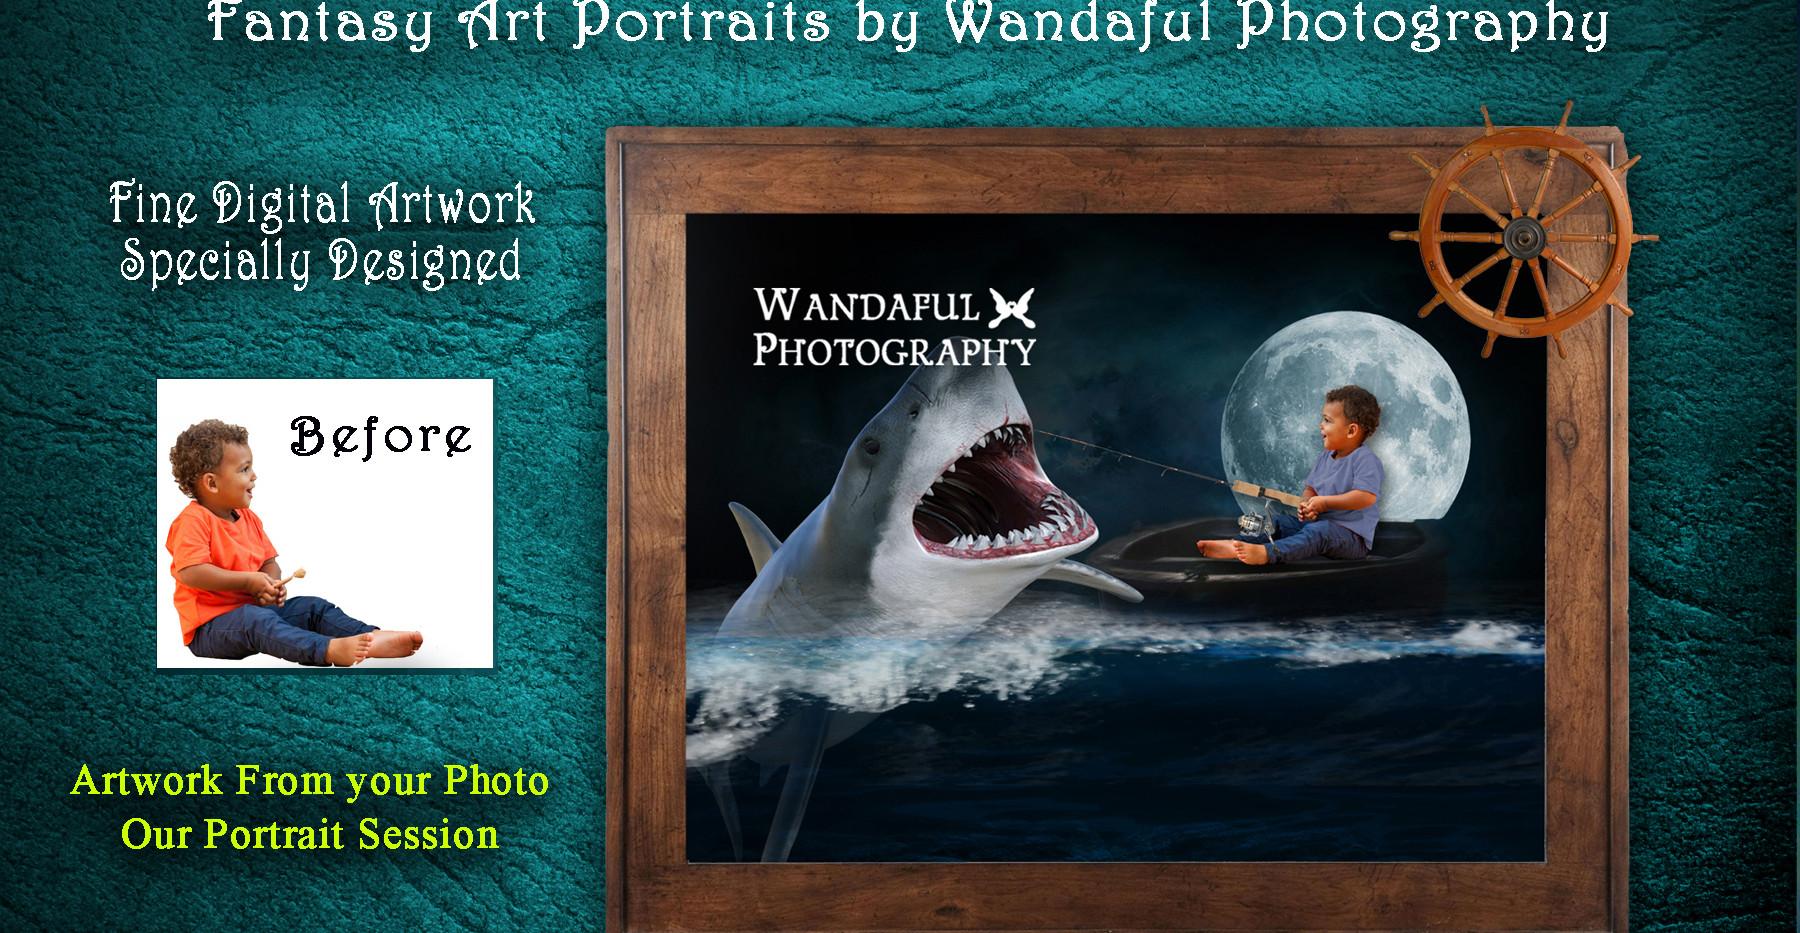 0 Bobby & boat by wp.jpg